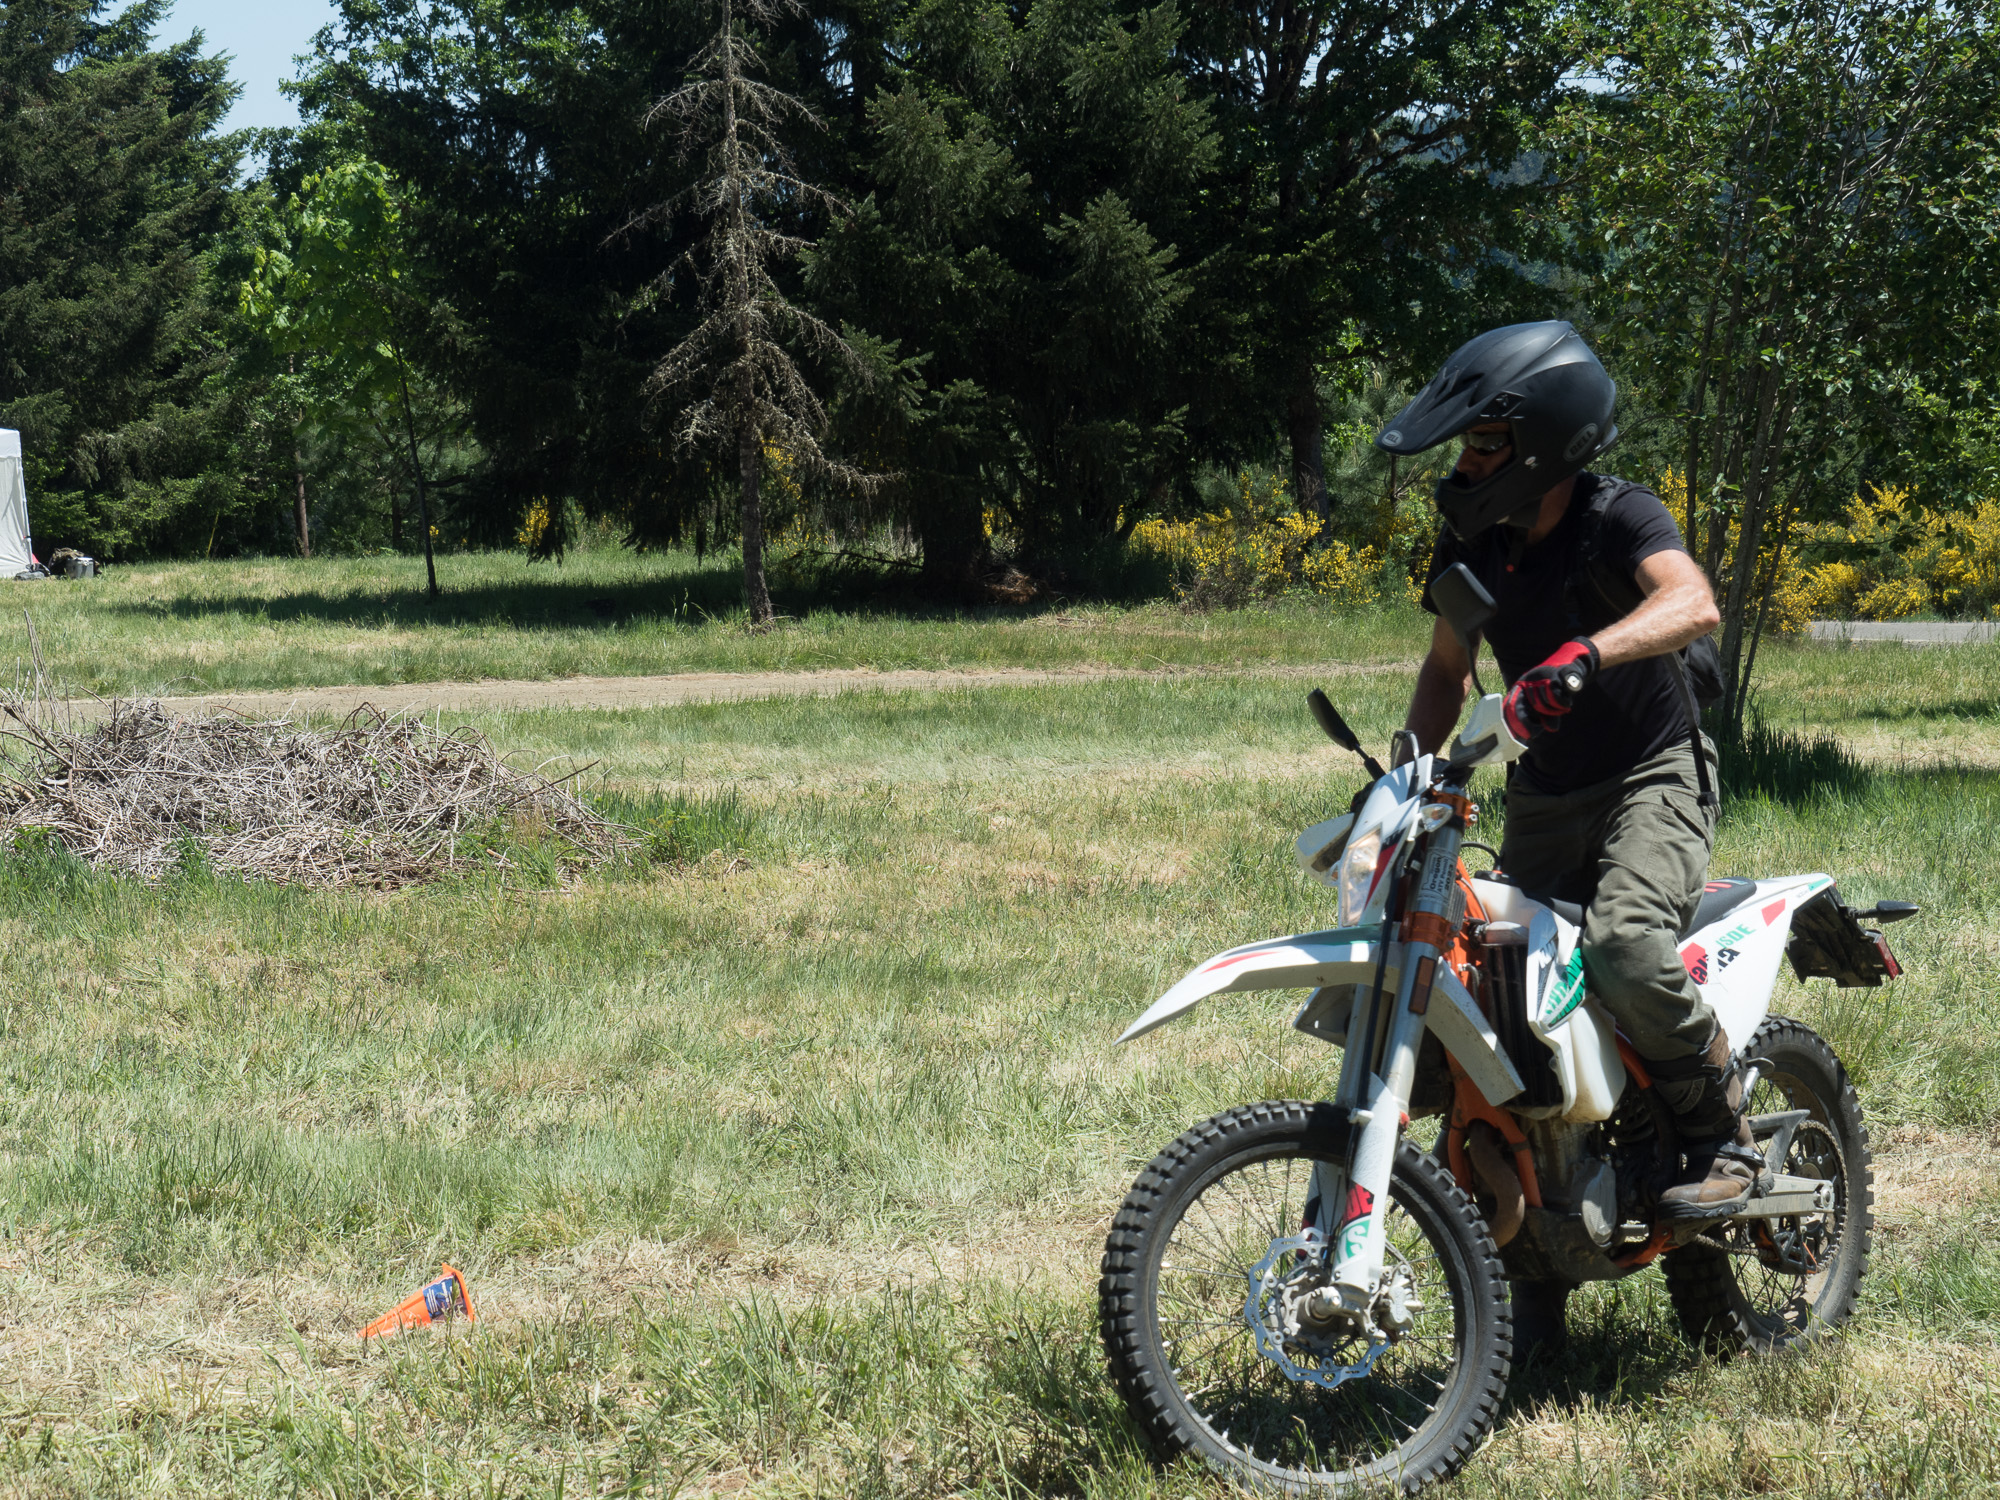 sheADV moto training course level 1/2 stop starts